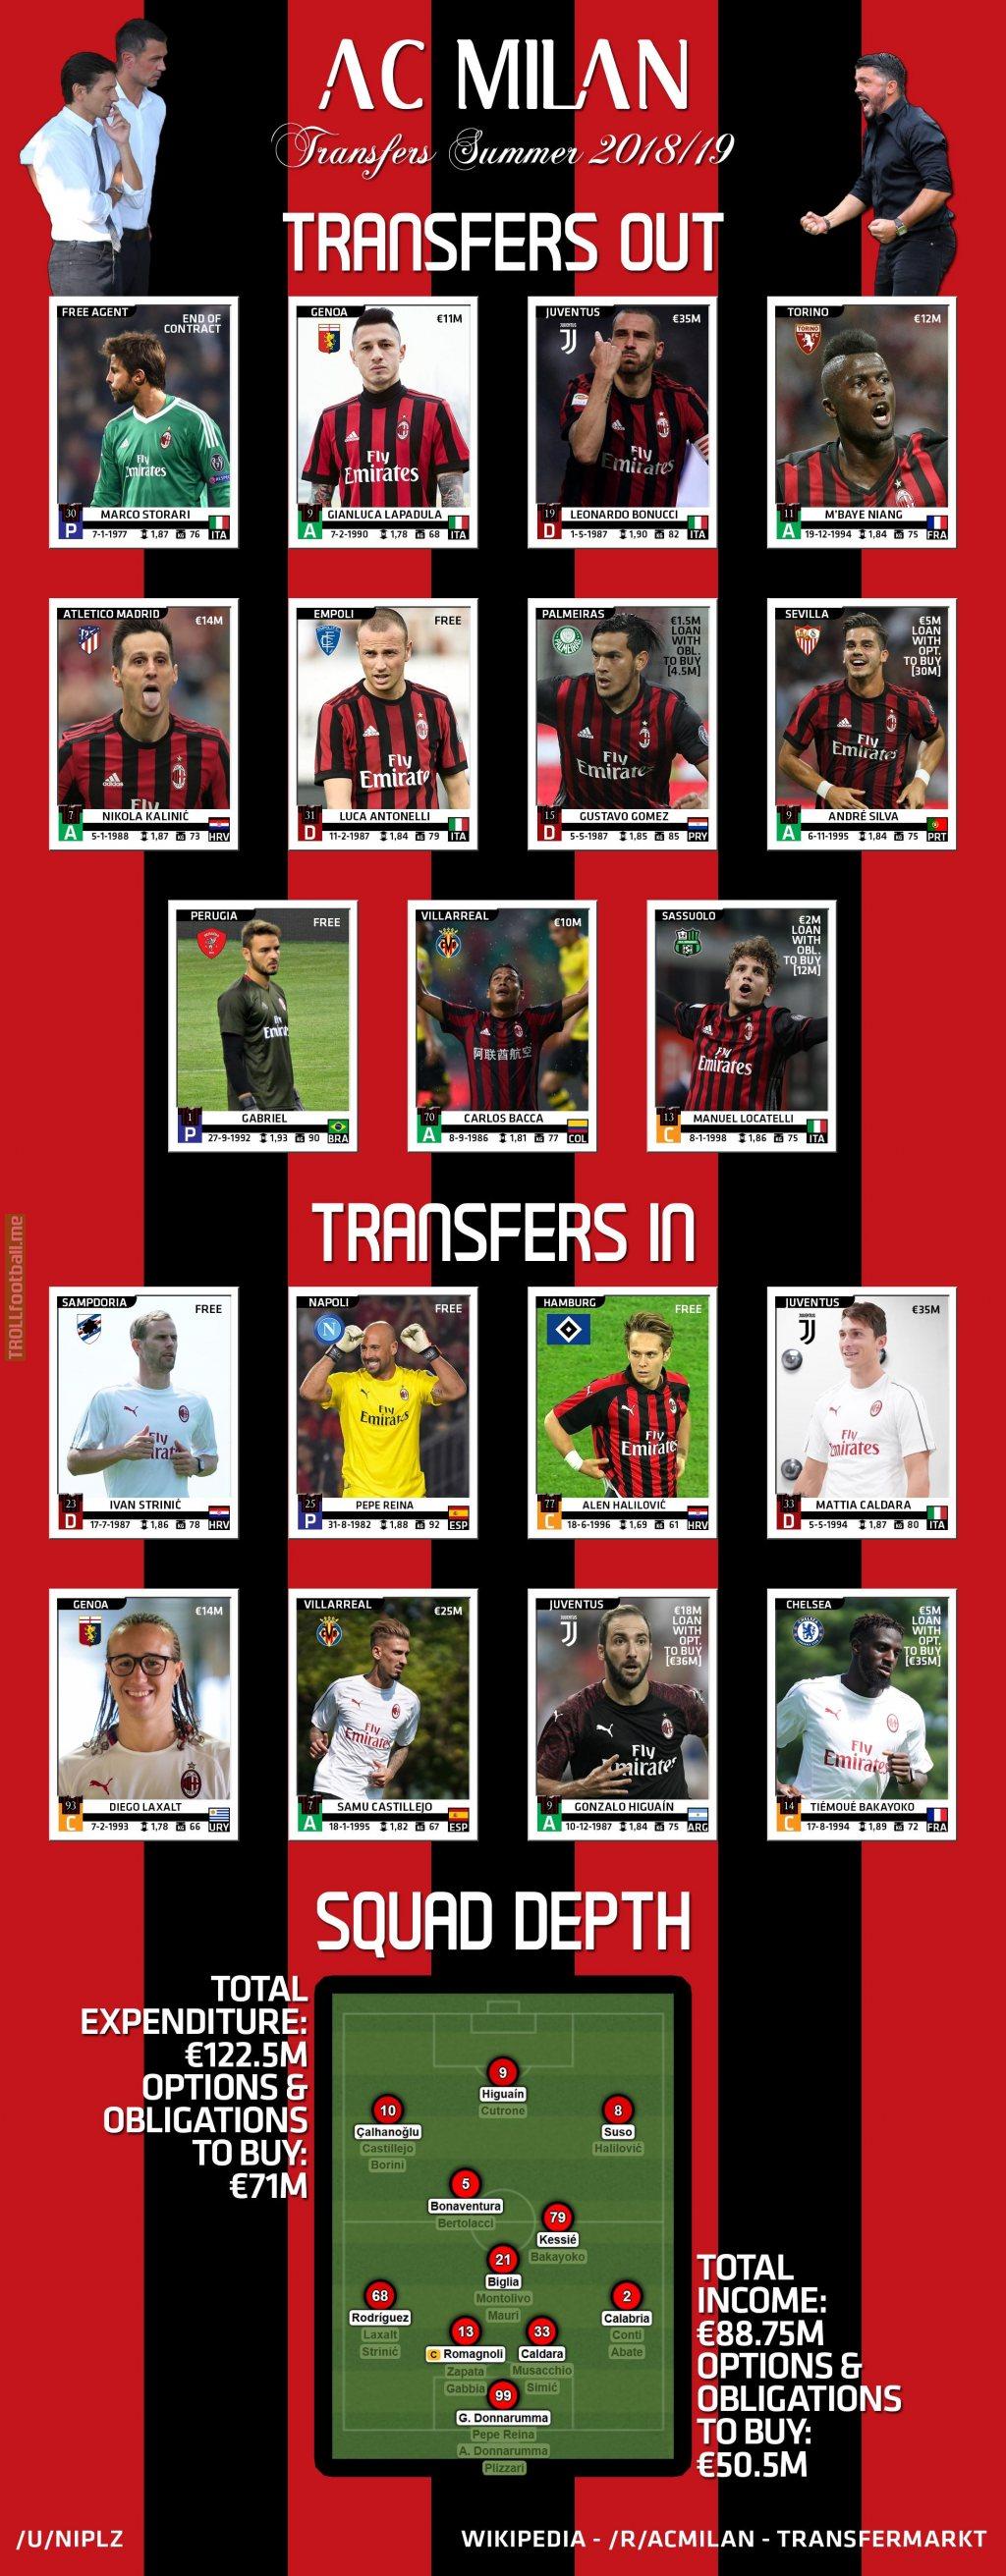 AC Milan's 2018 Summer Transfer Window - A Visual Summary